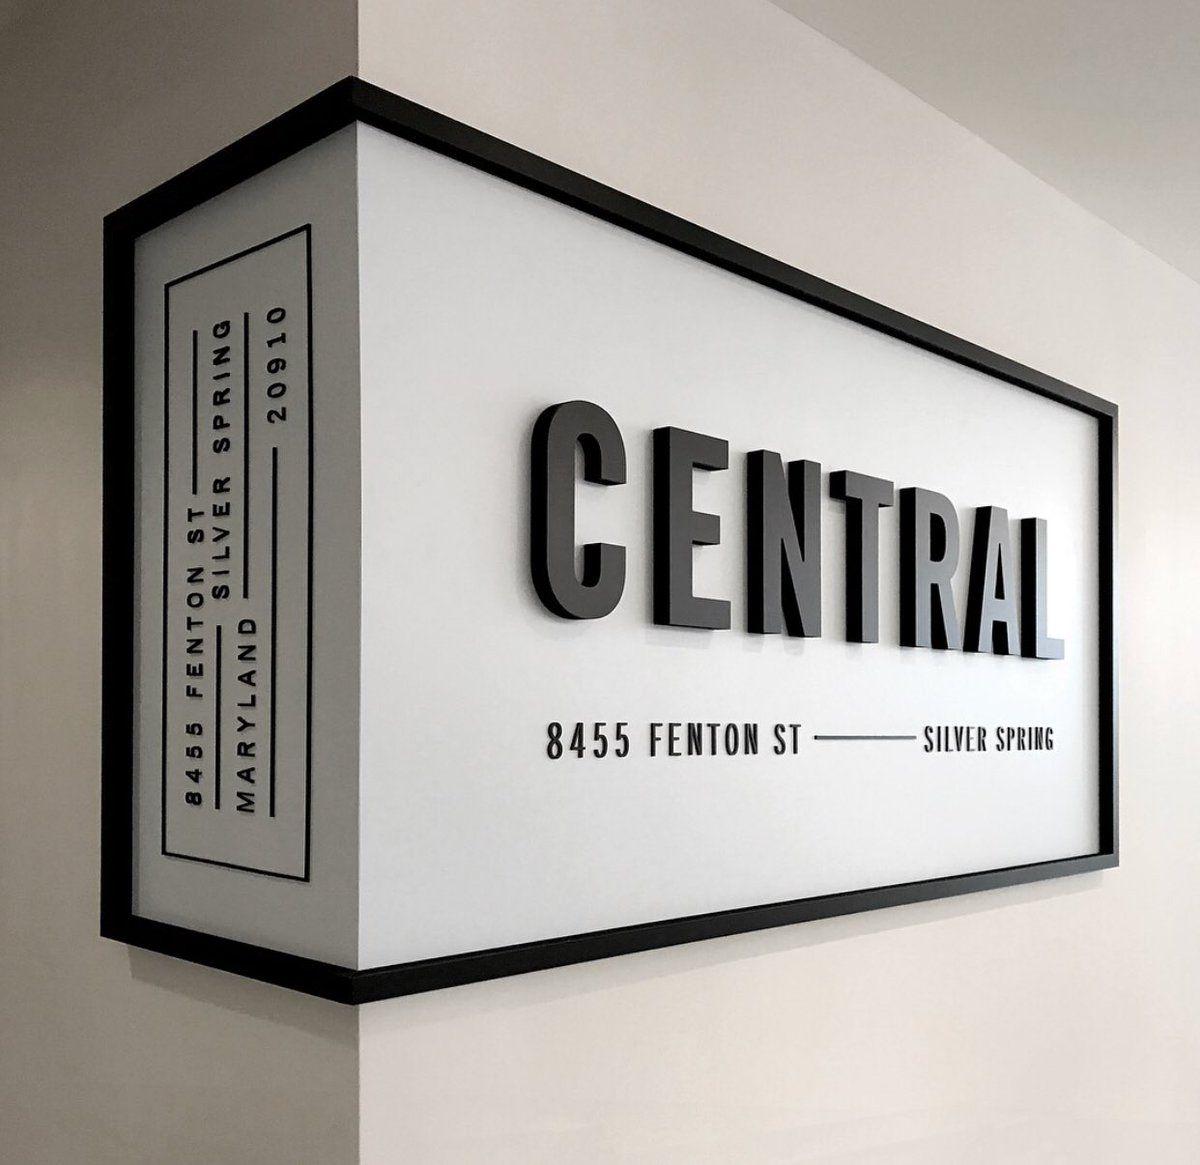 Related Image Branding Pinterest Signage # Muebles Dico Power Center